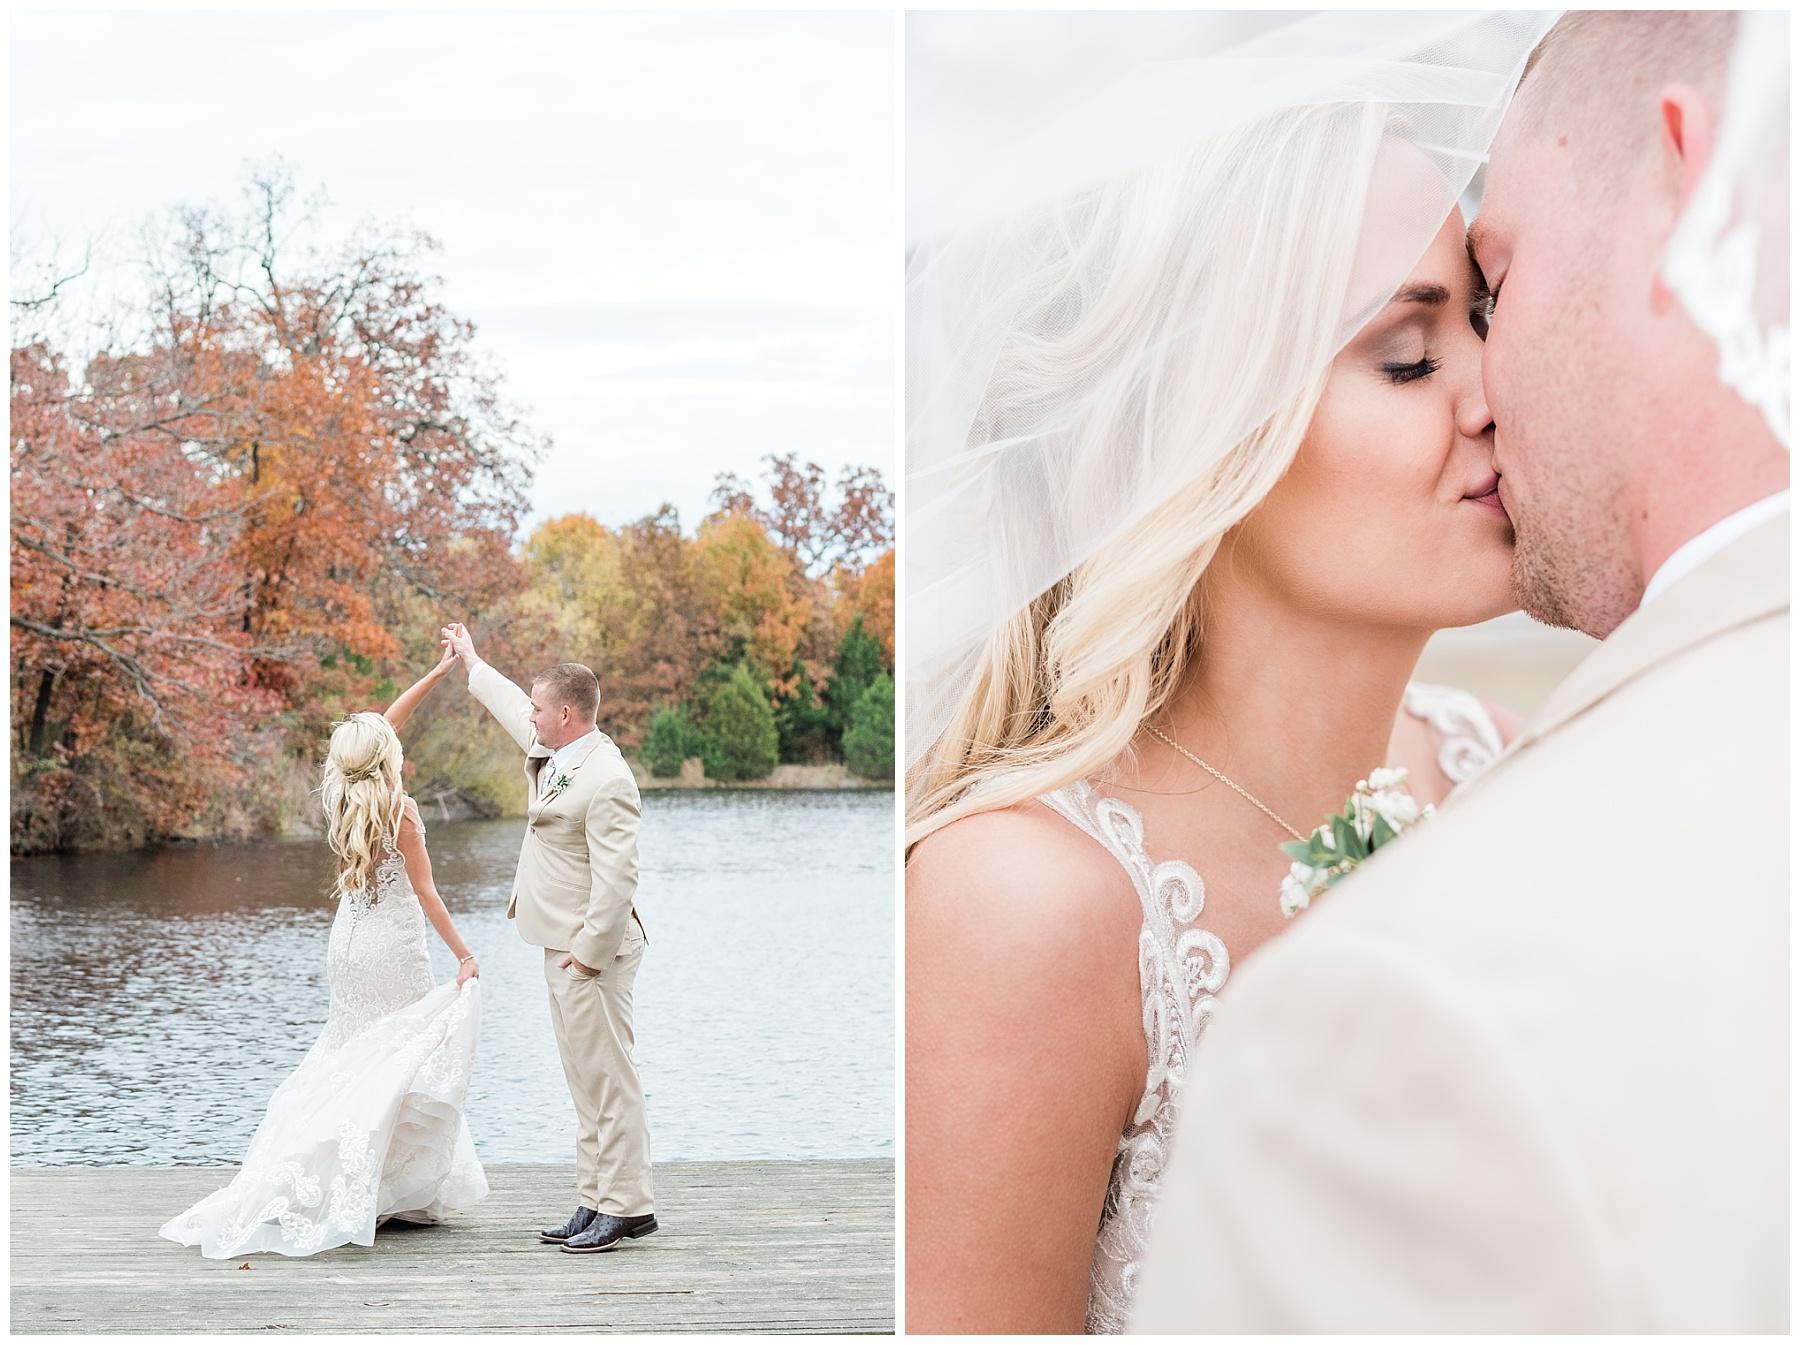 Lakeside Wedding in Fall at Mighty Oak Lodge by Misouri Wedding Photographer Kelsi Kliethermes Photography_0032.jpg